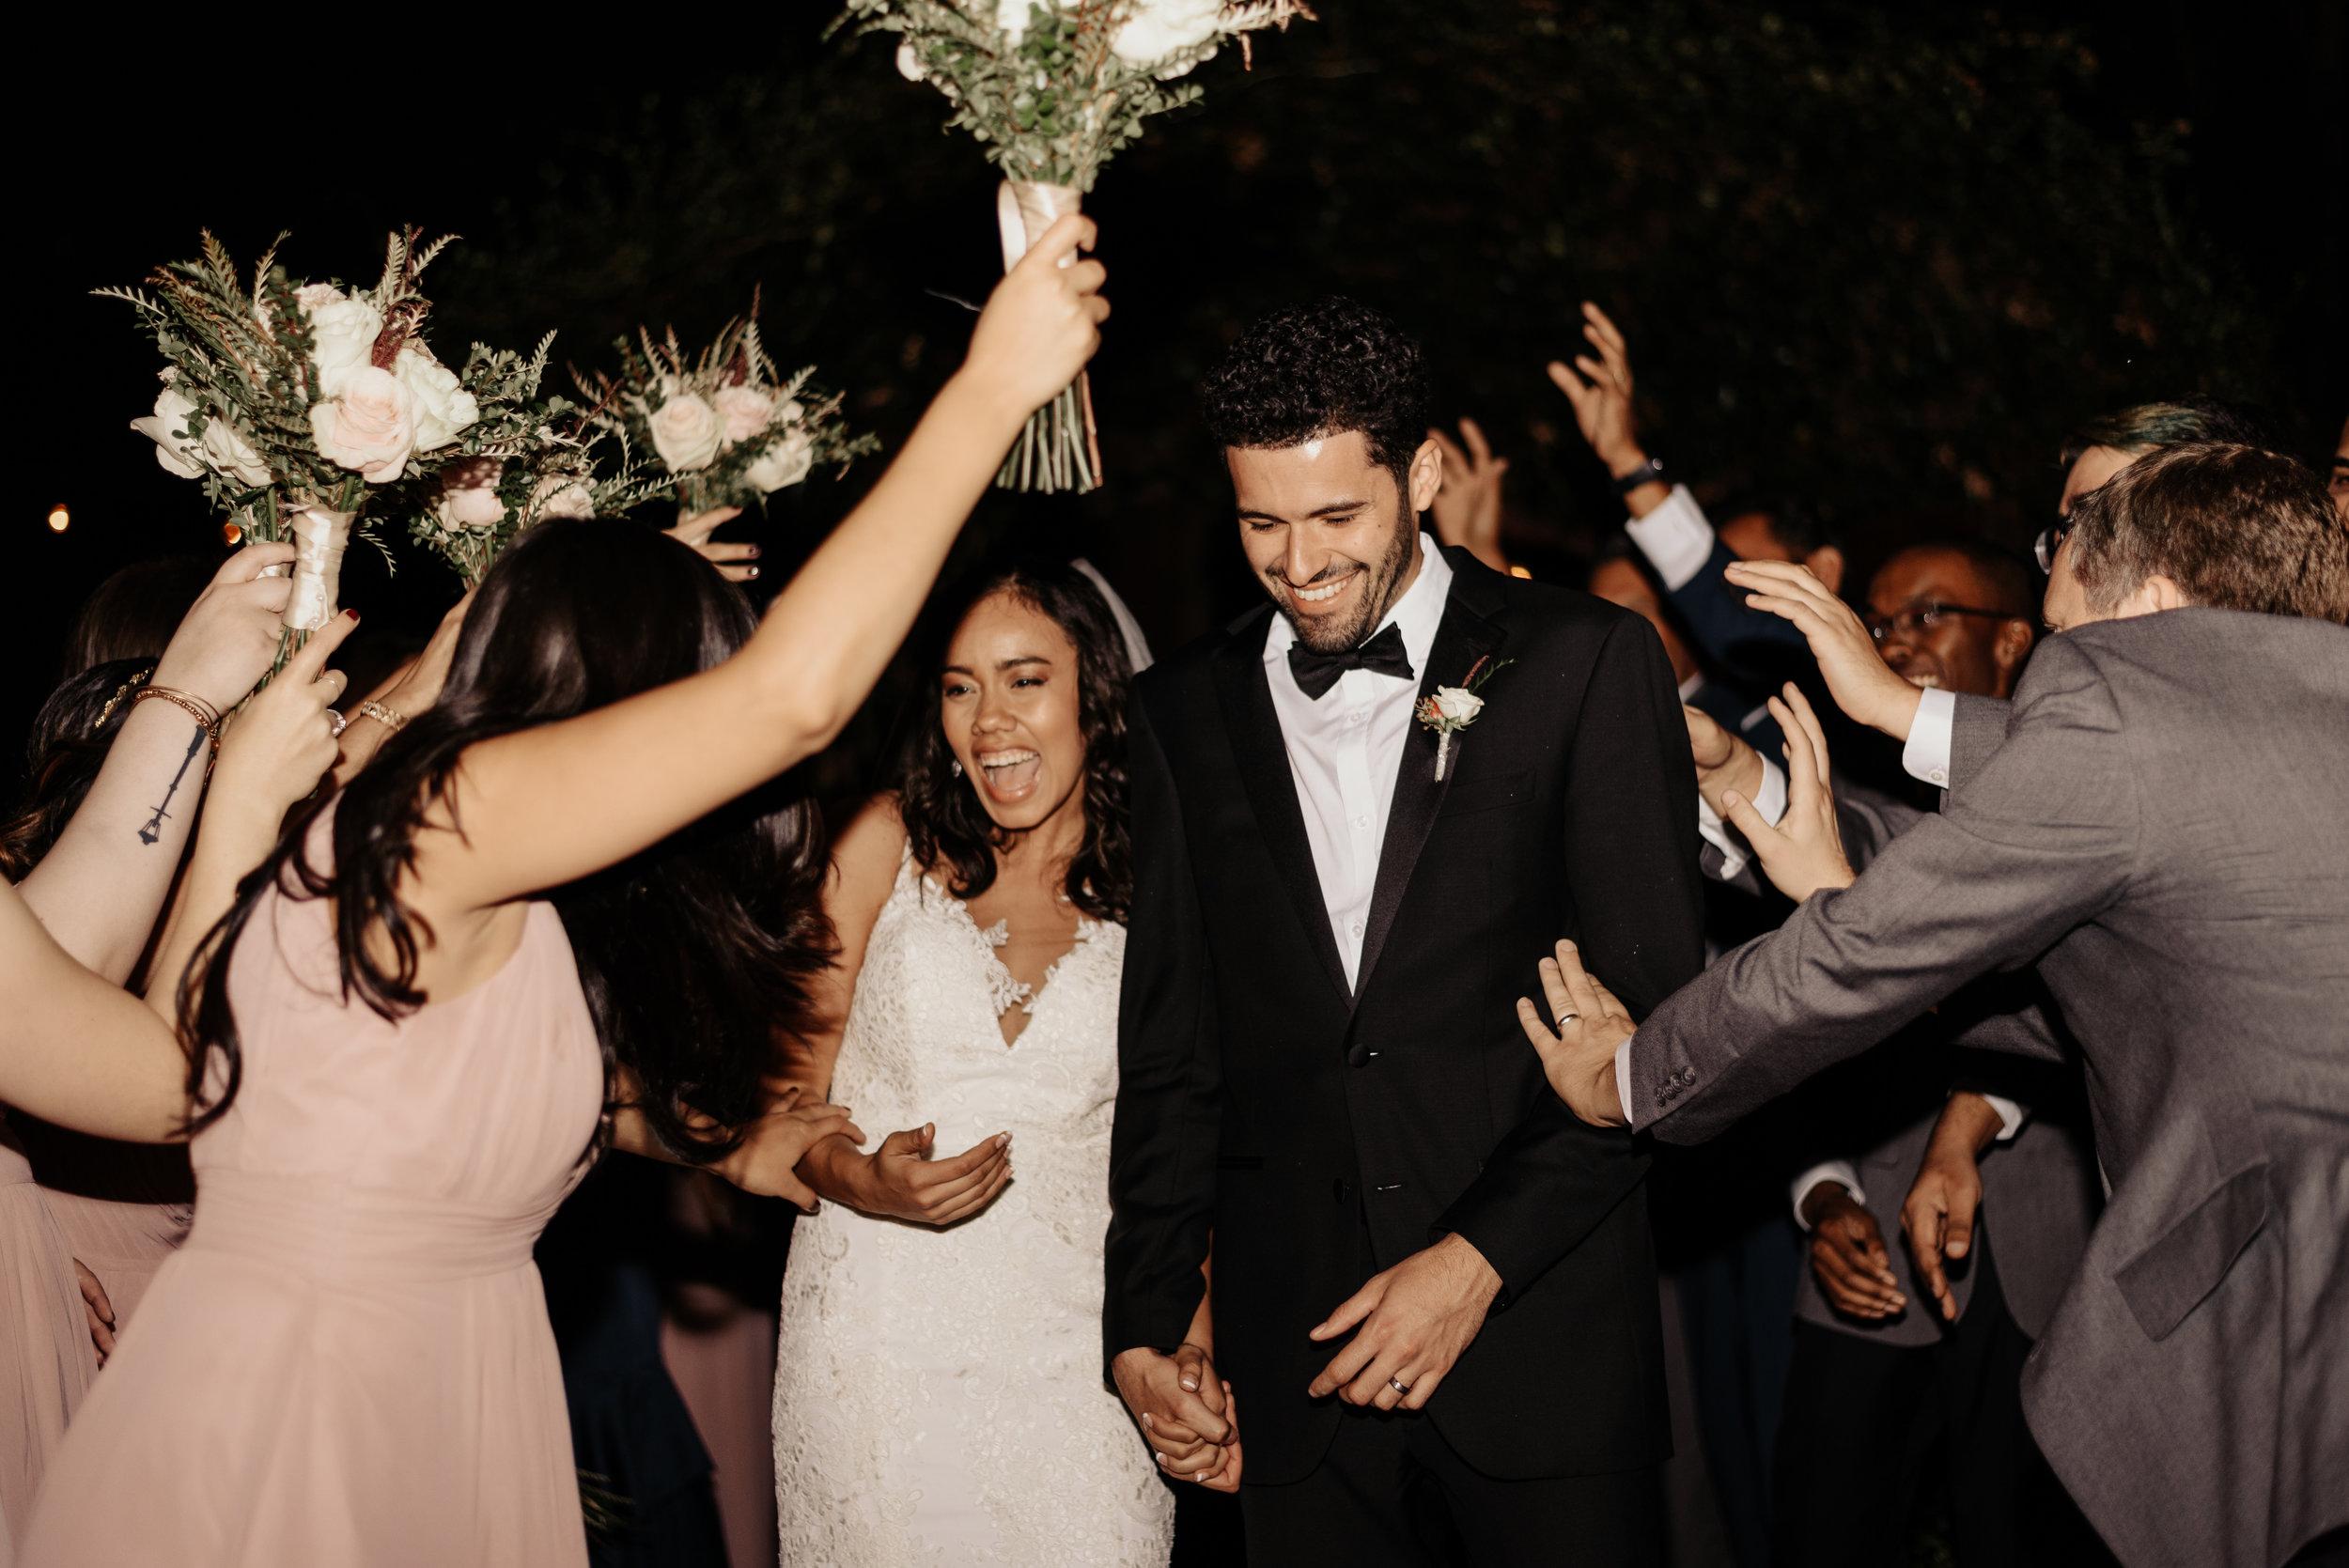 Kirstie-AJ-Wedding-9165.jpg